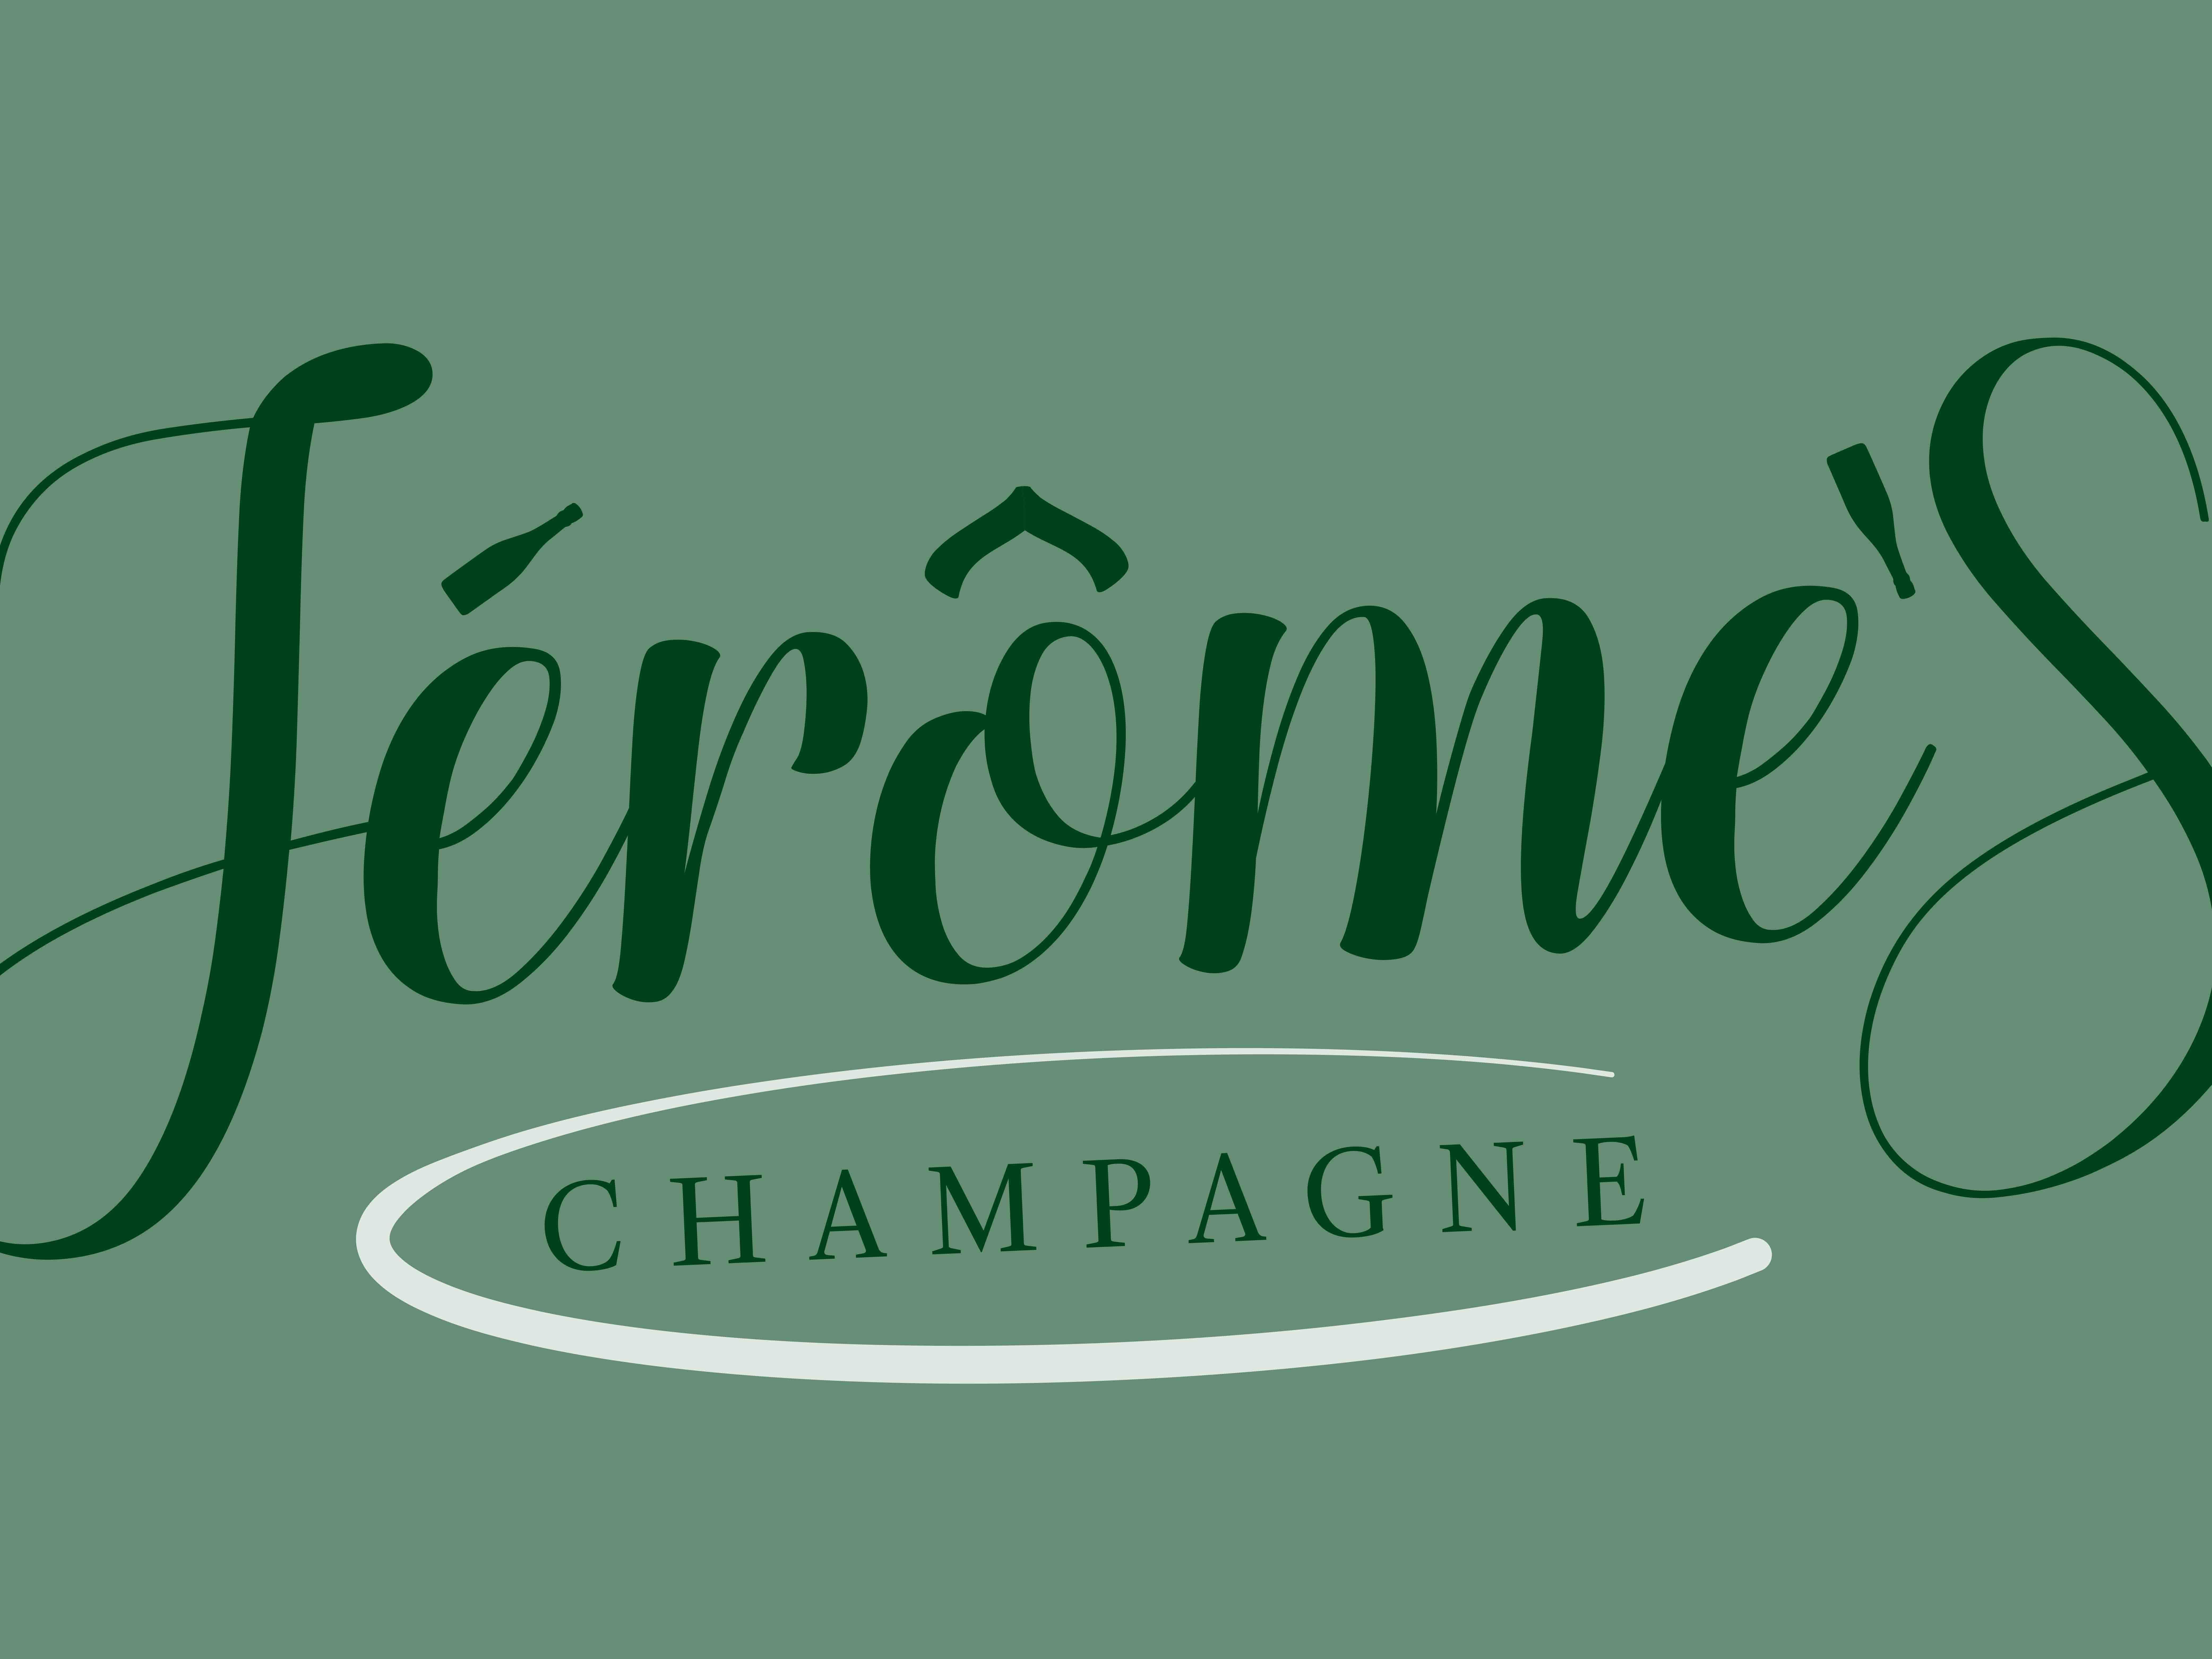 Jeromes